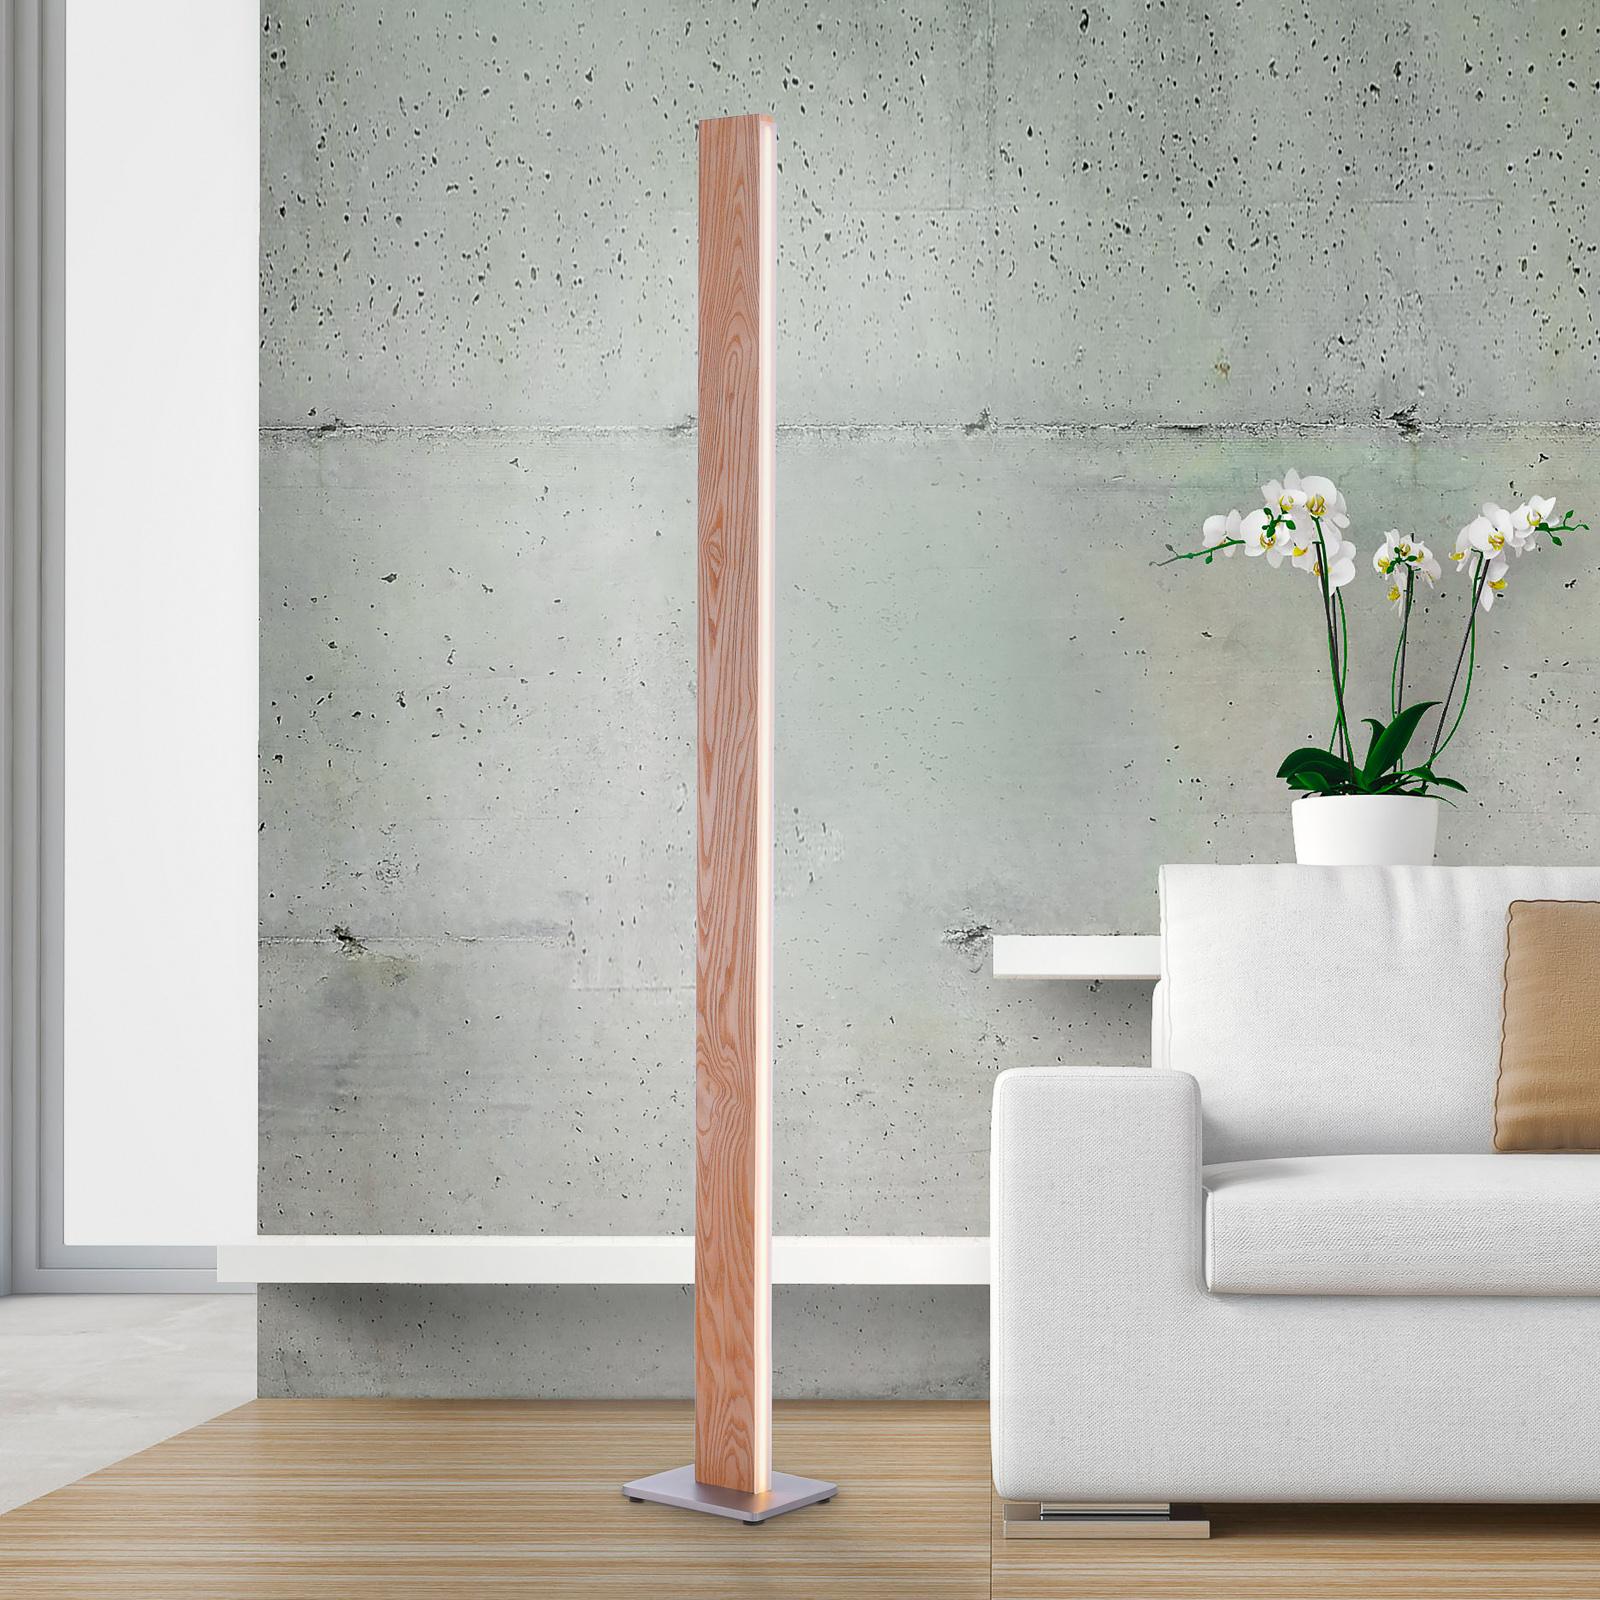 Paul Neuhaus Q-TIMBER lampadaire LED avec bois